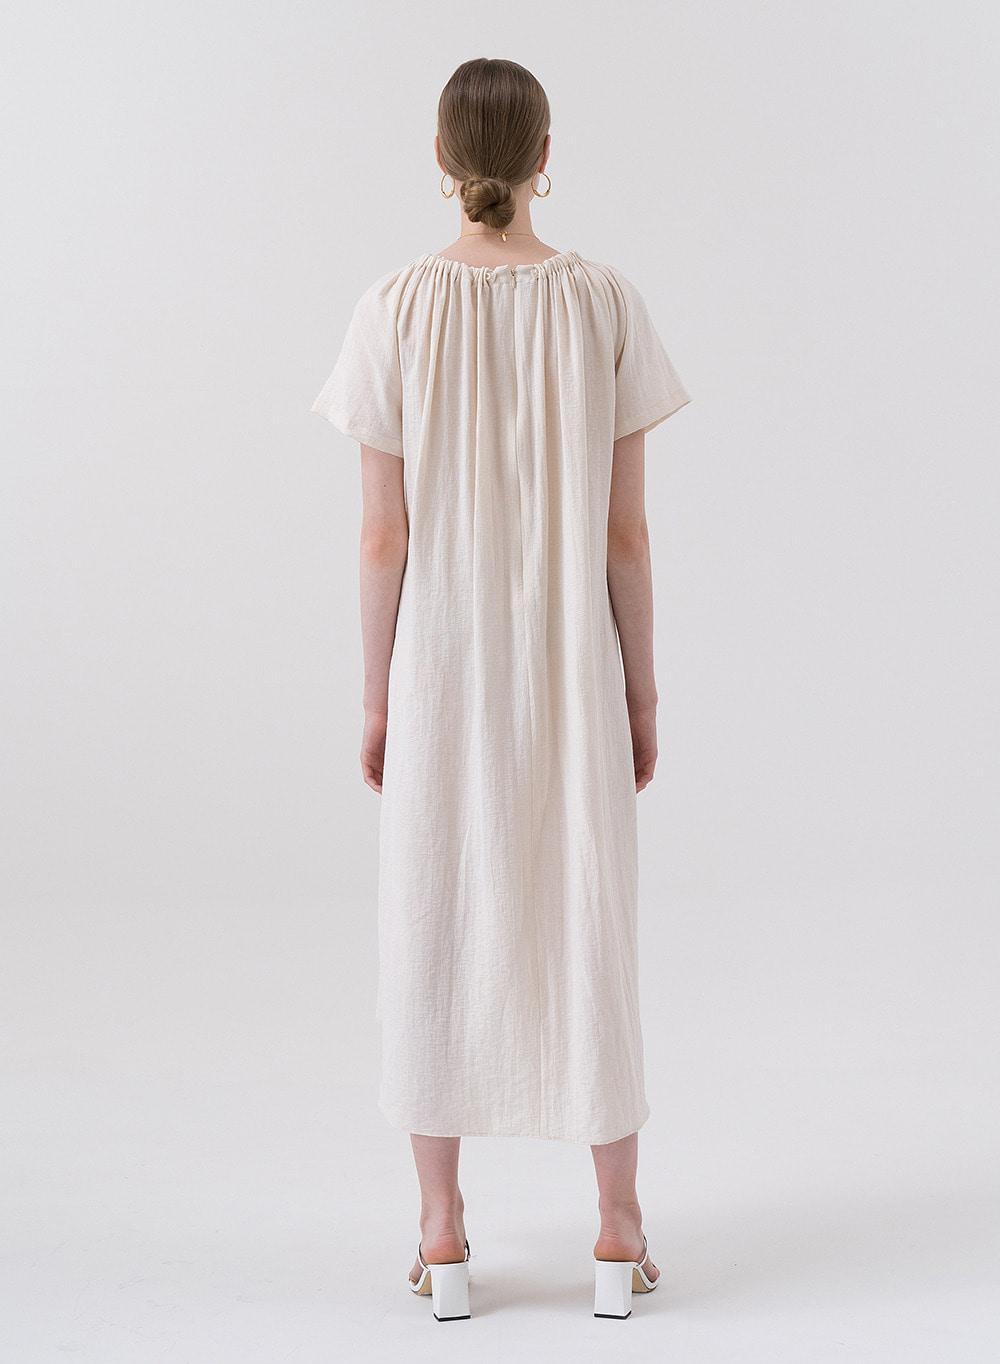 SS20 Drawstring Dress Cream